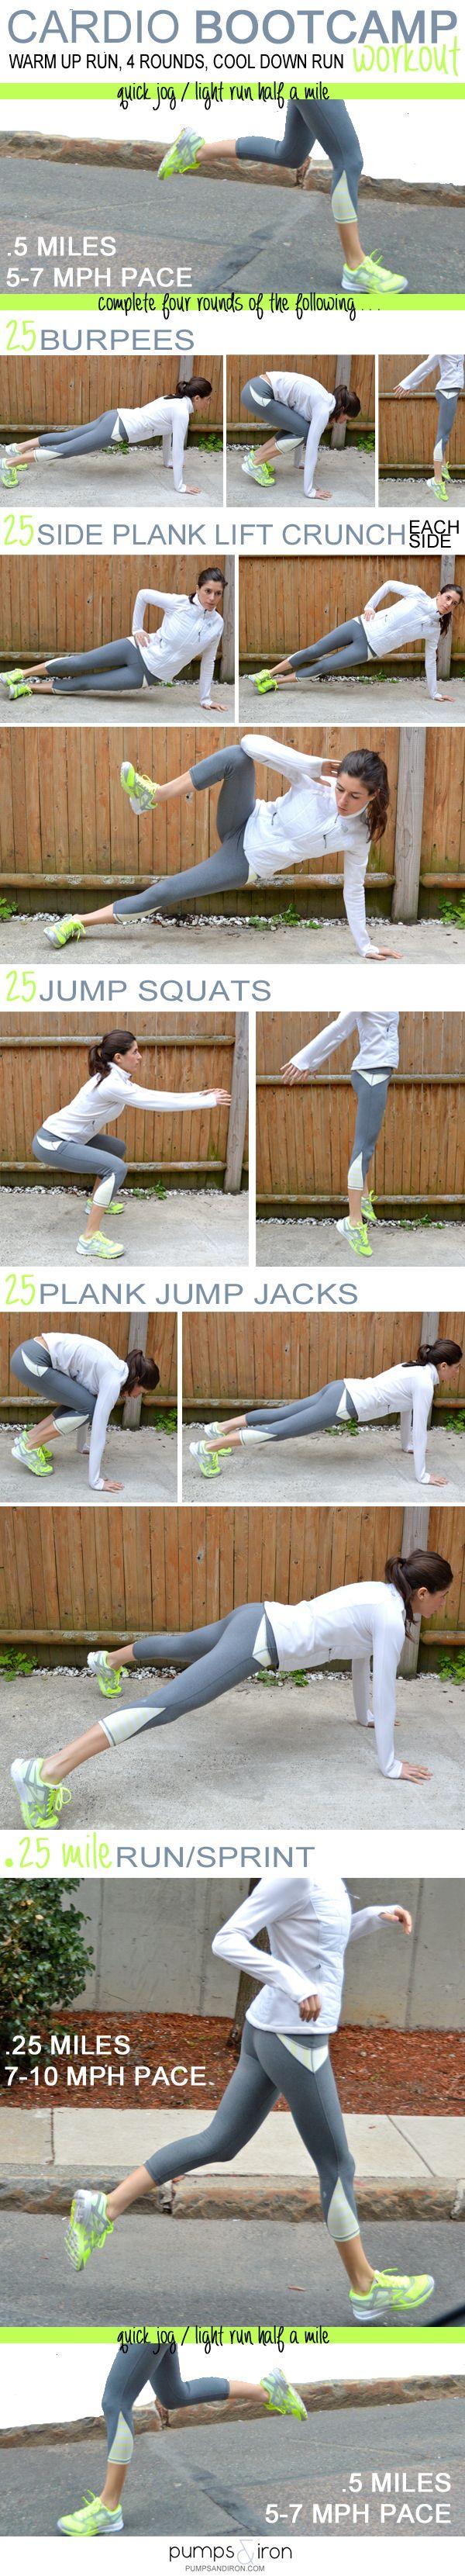 Cardio Boot Camp Workout